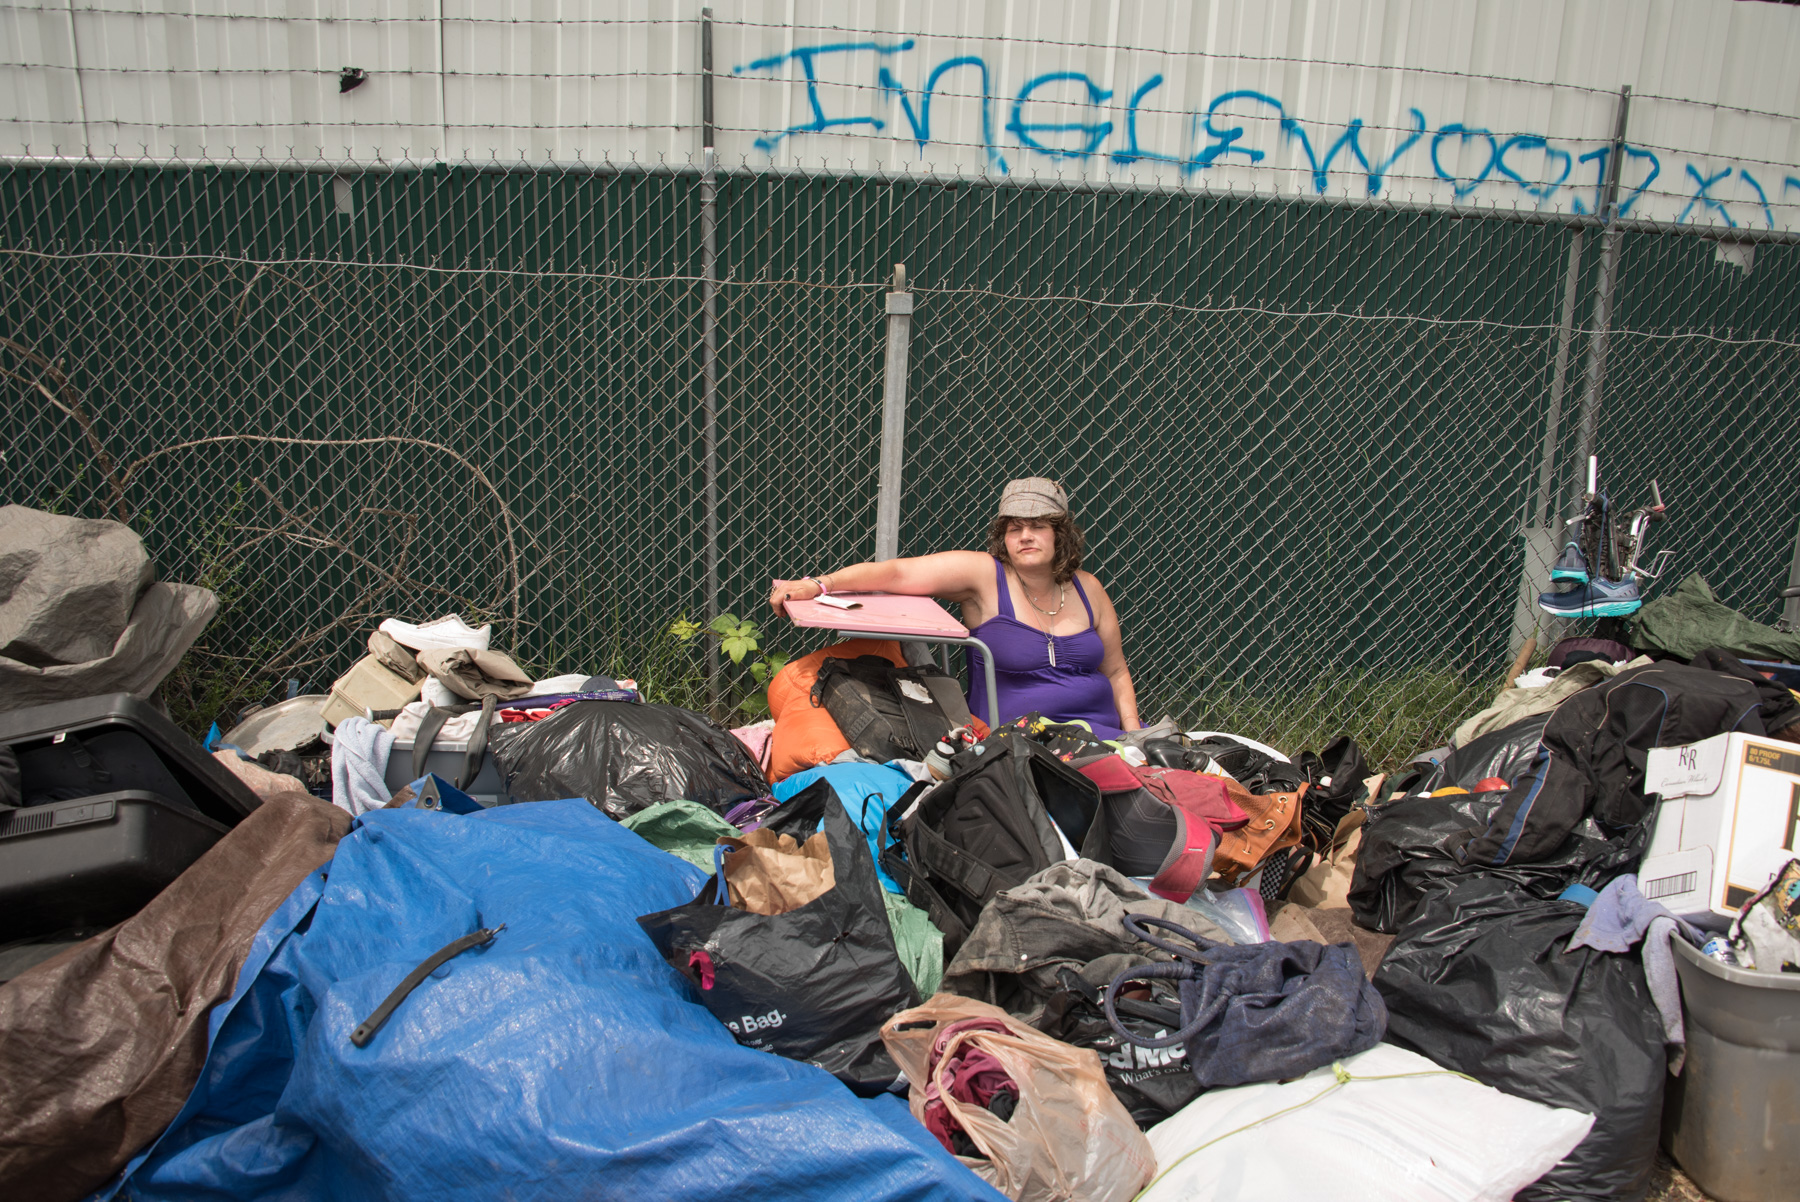 Liz_Obert_Urban campers_Robin after the sweep-4.jpg